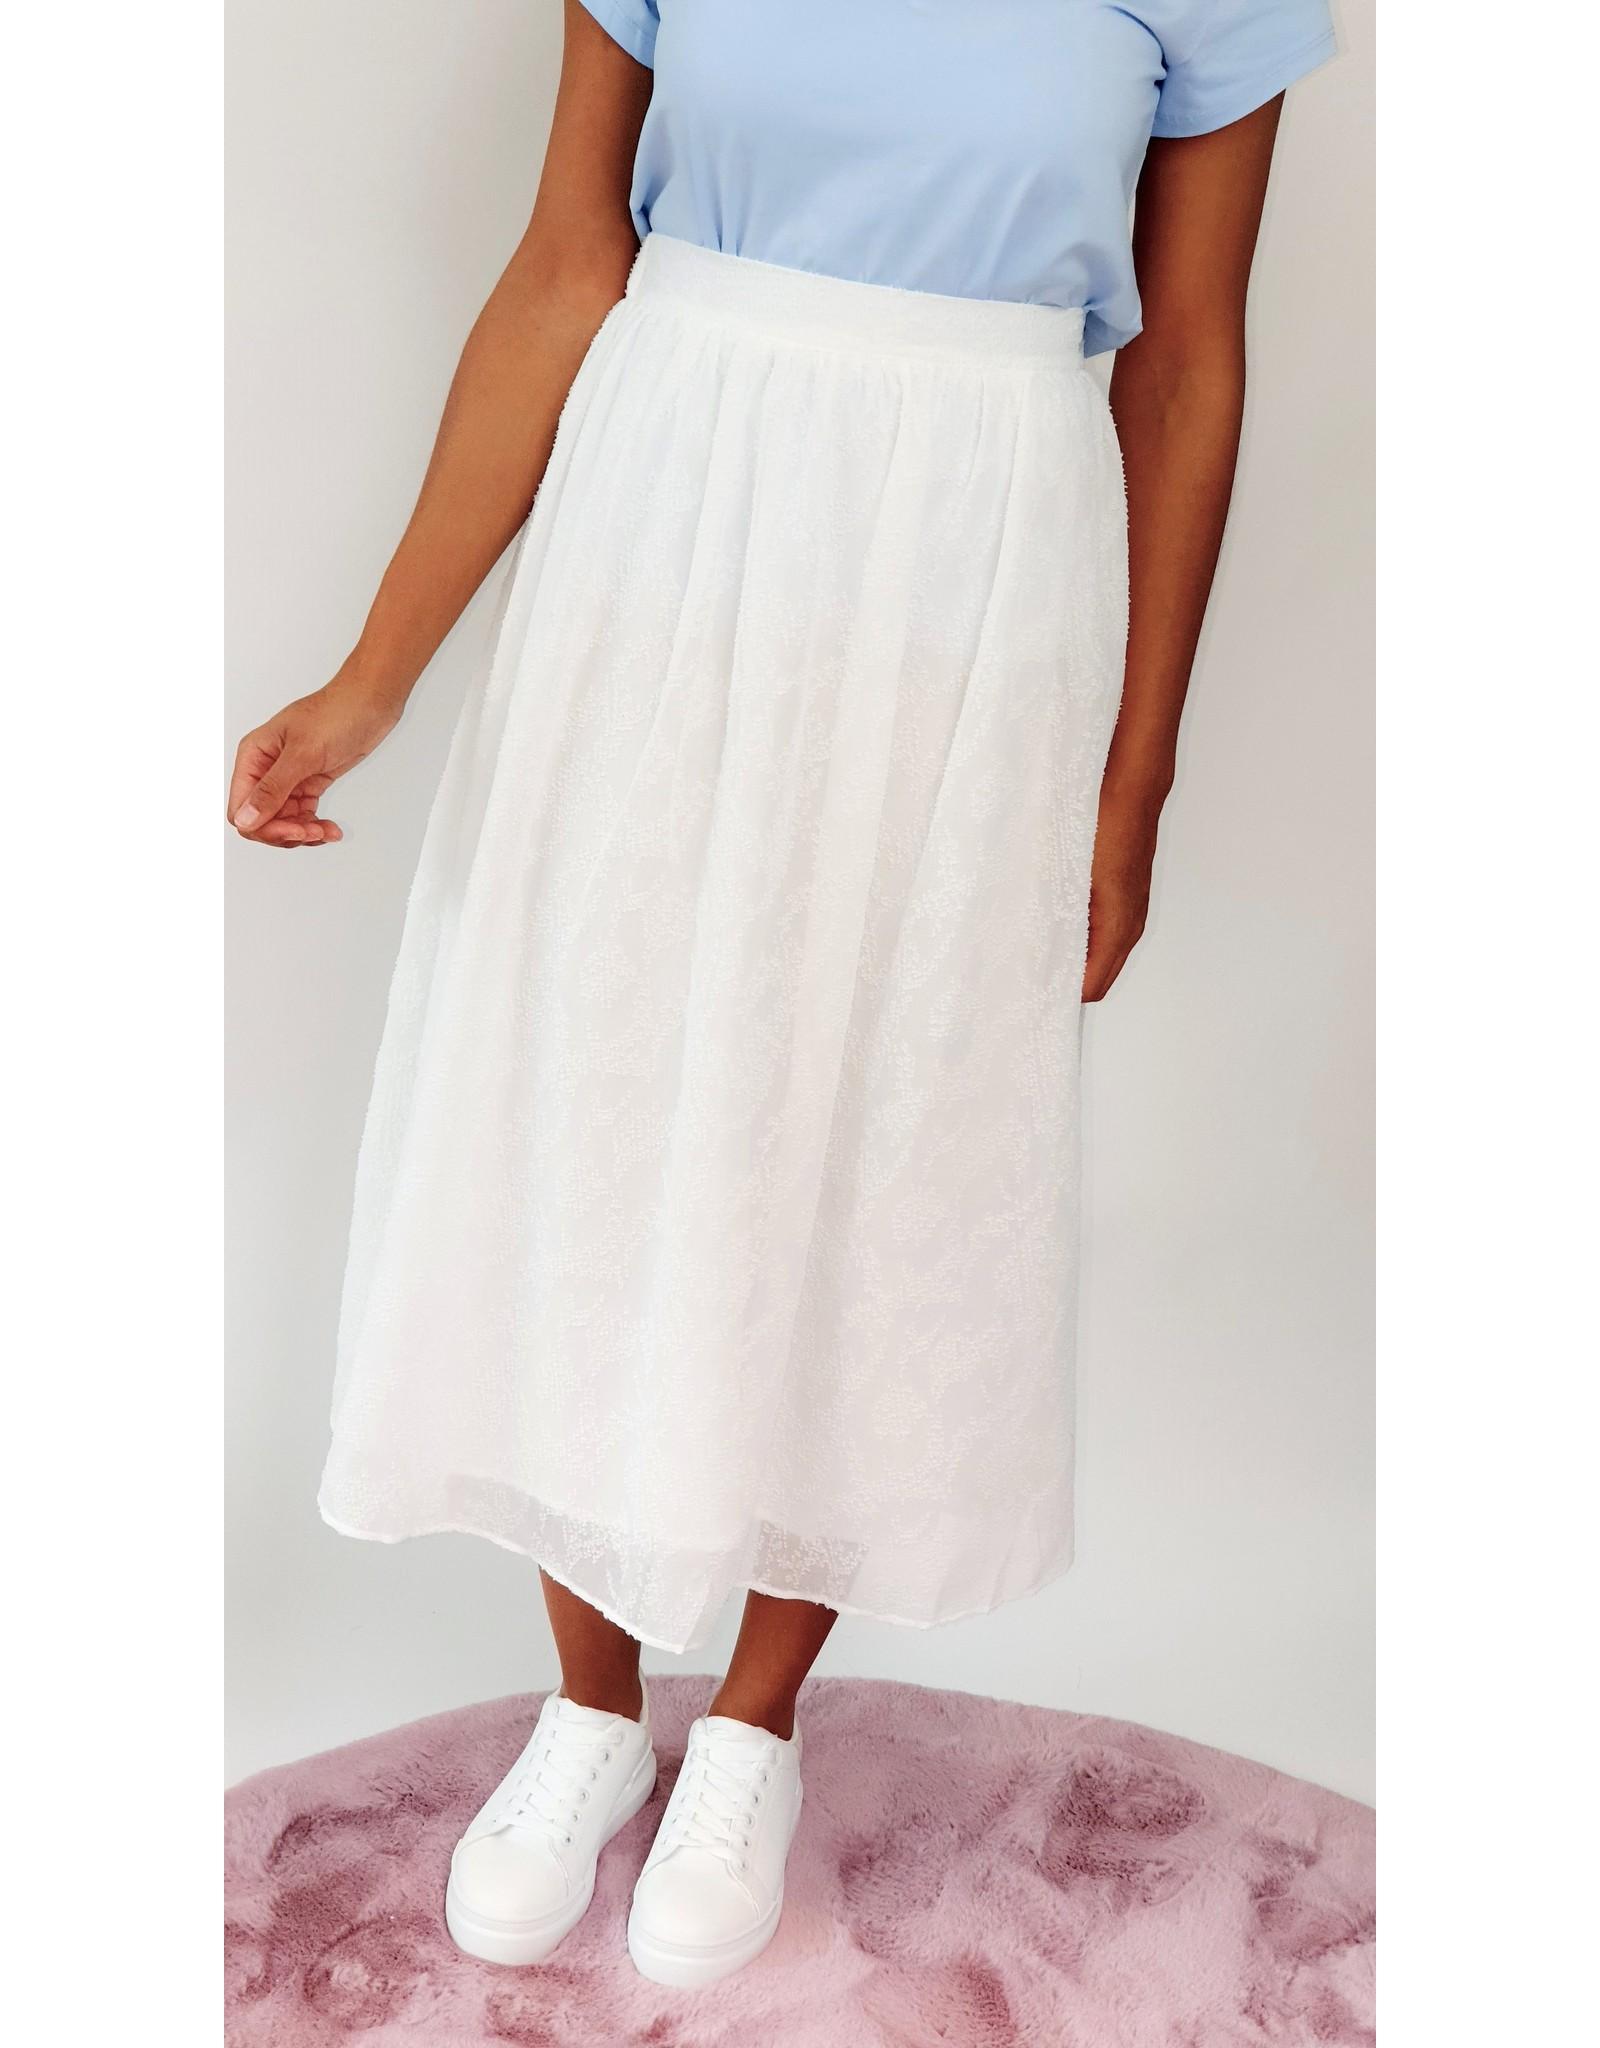 Romantic casual skirt